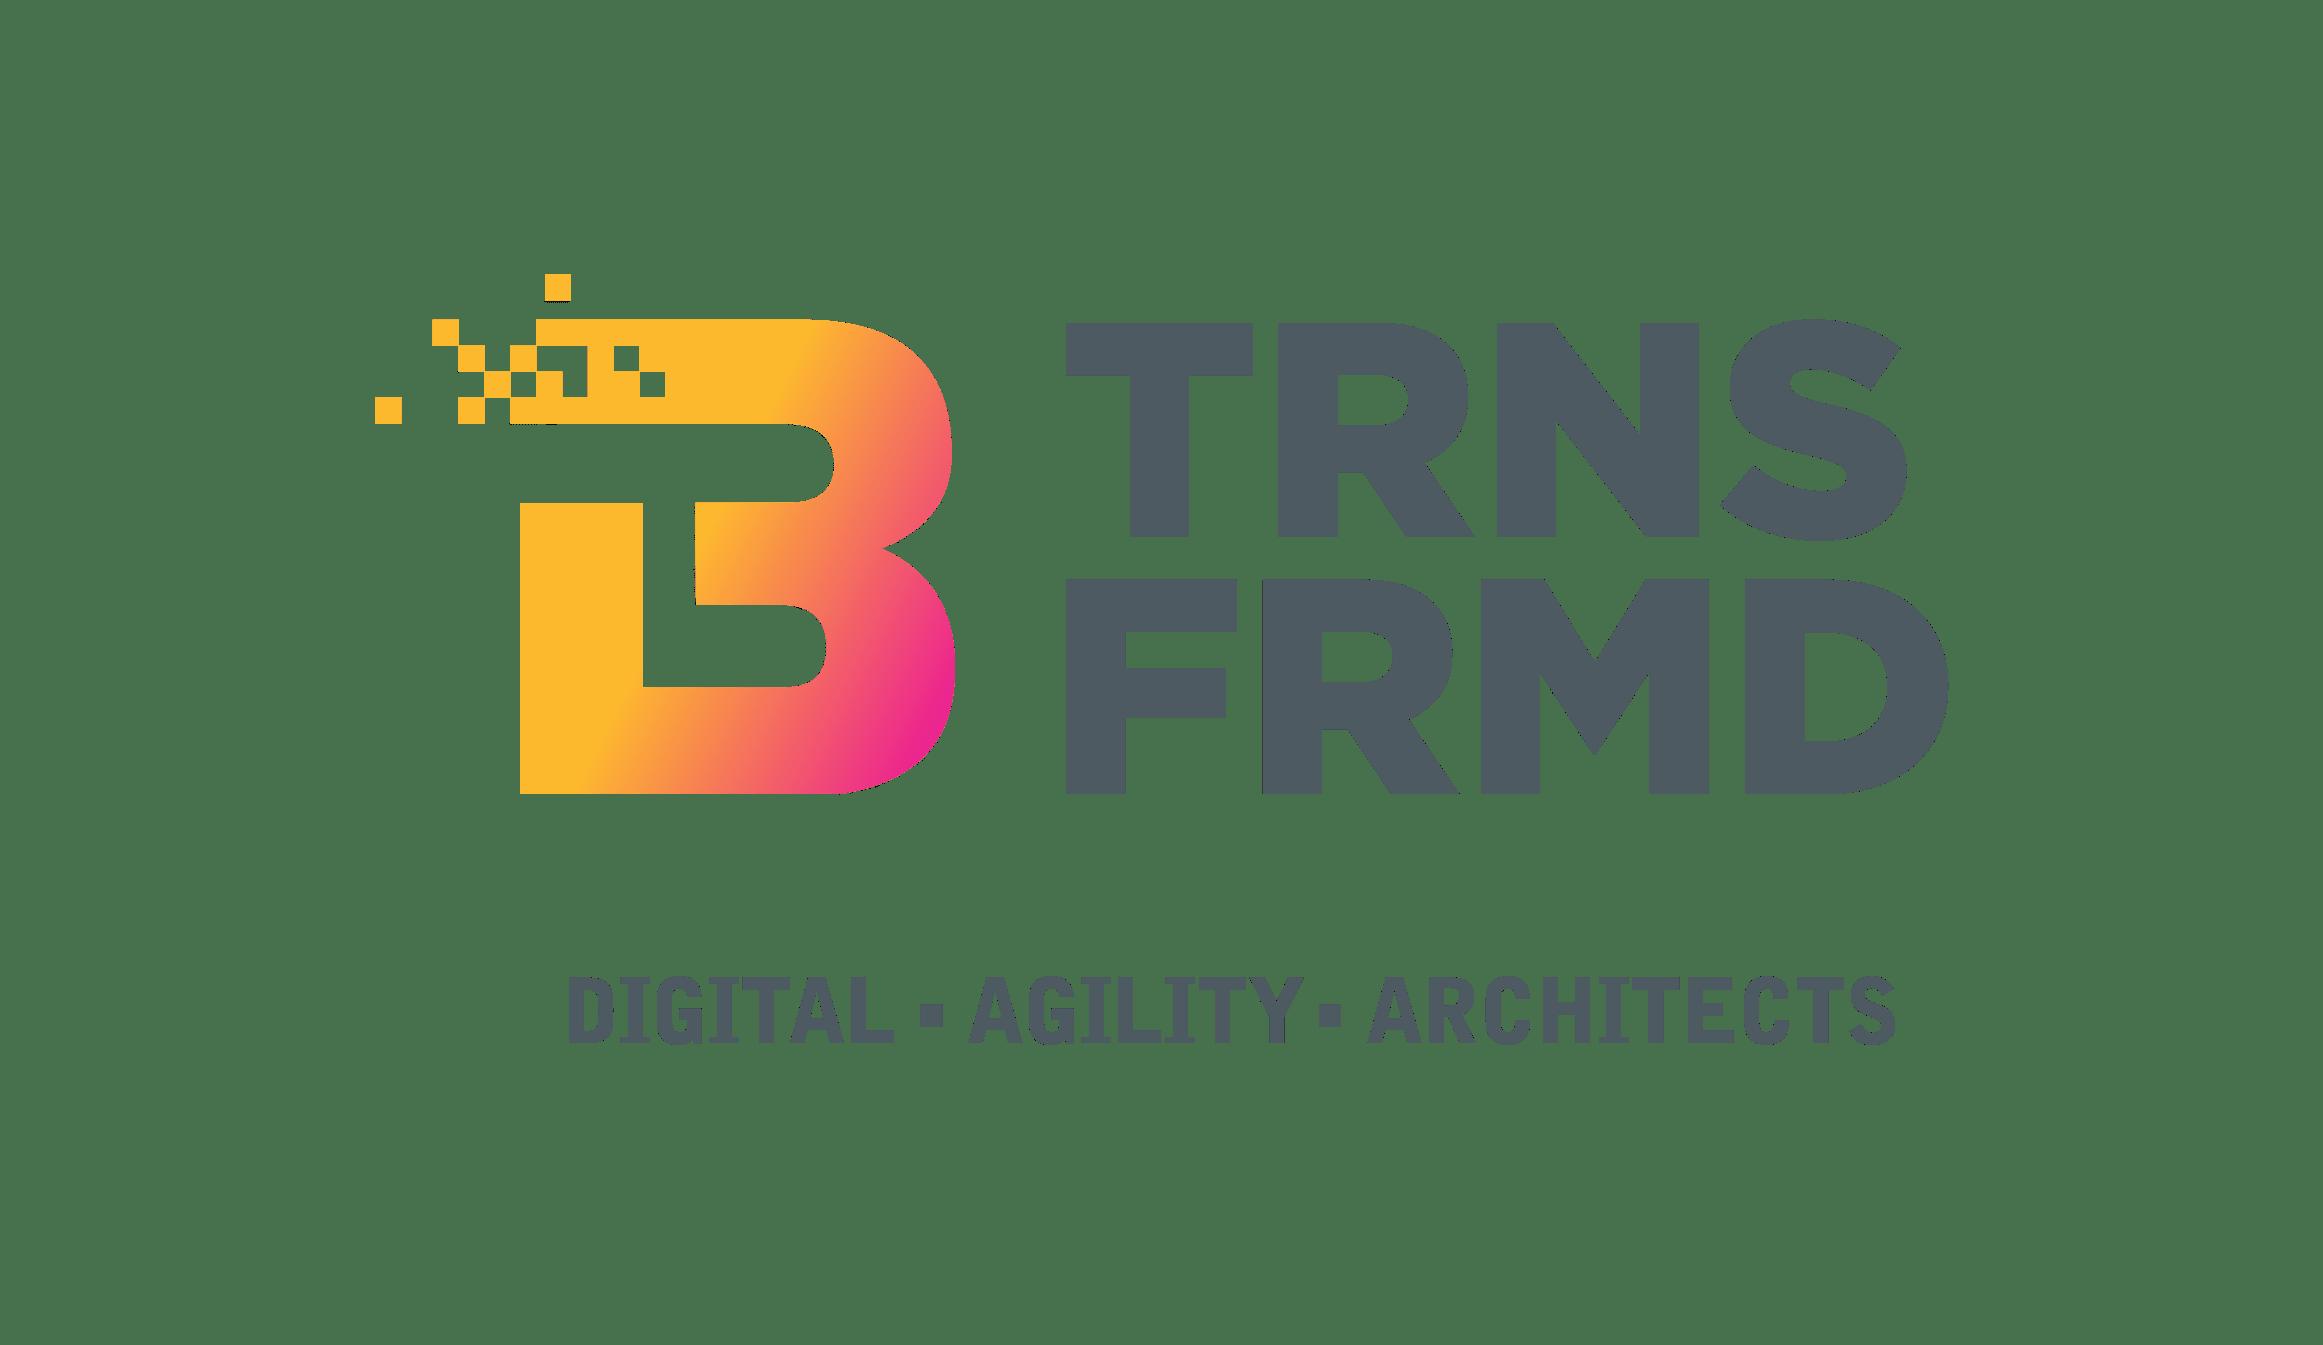 B-TRNSFRMD